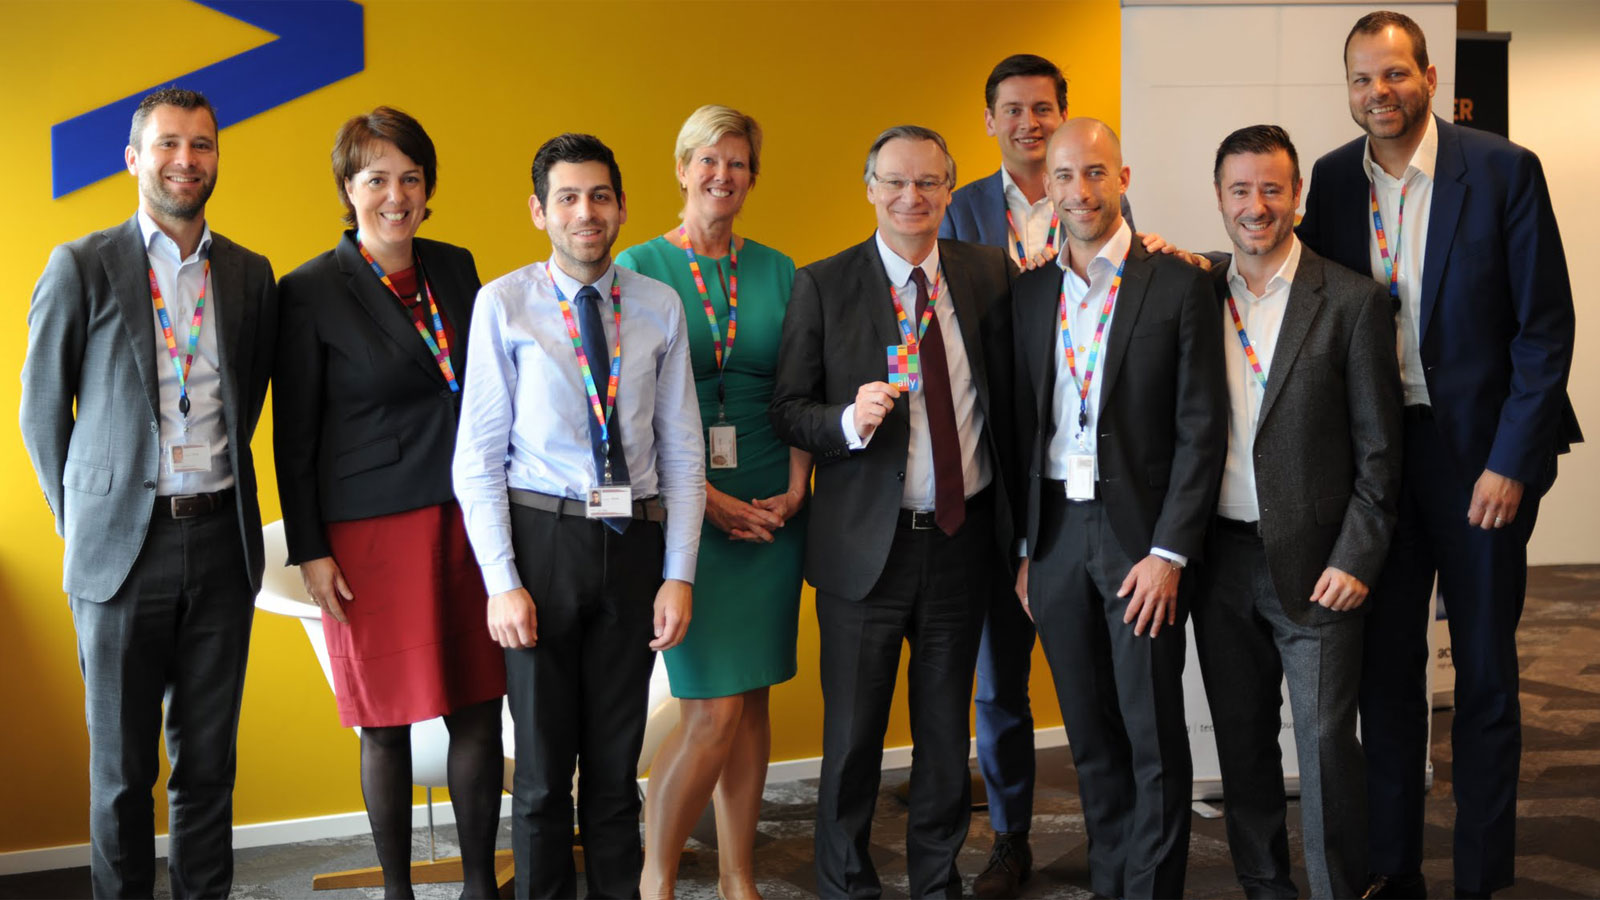 Accenture Lgbt Careers